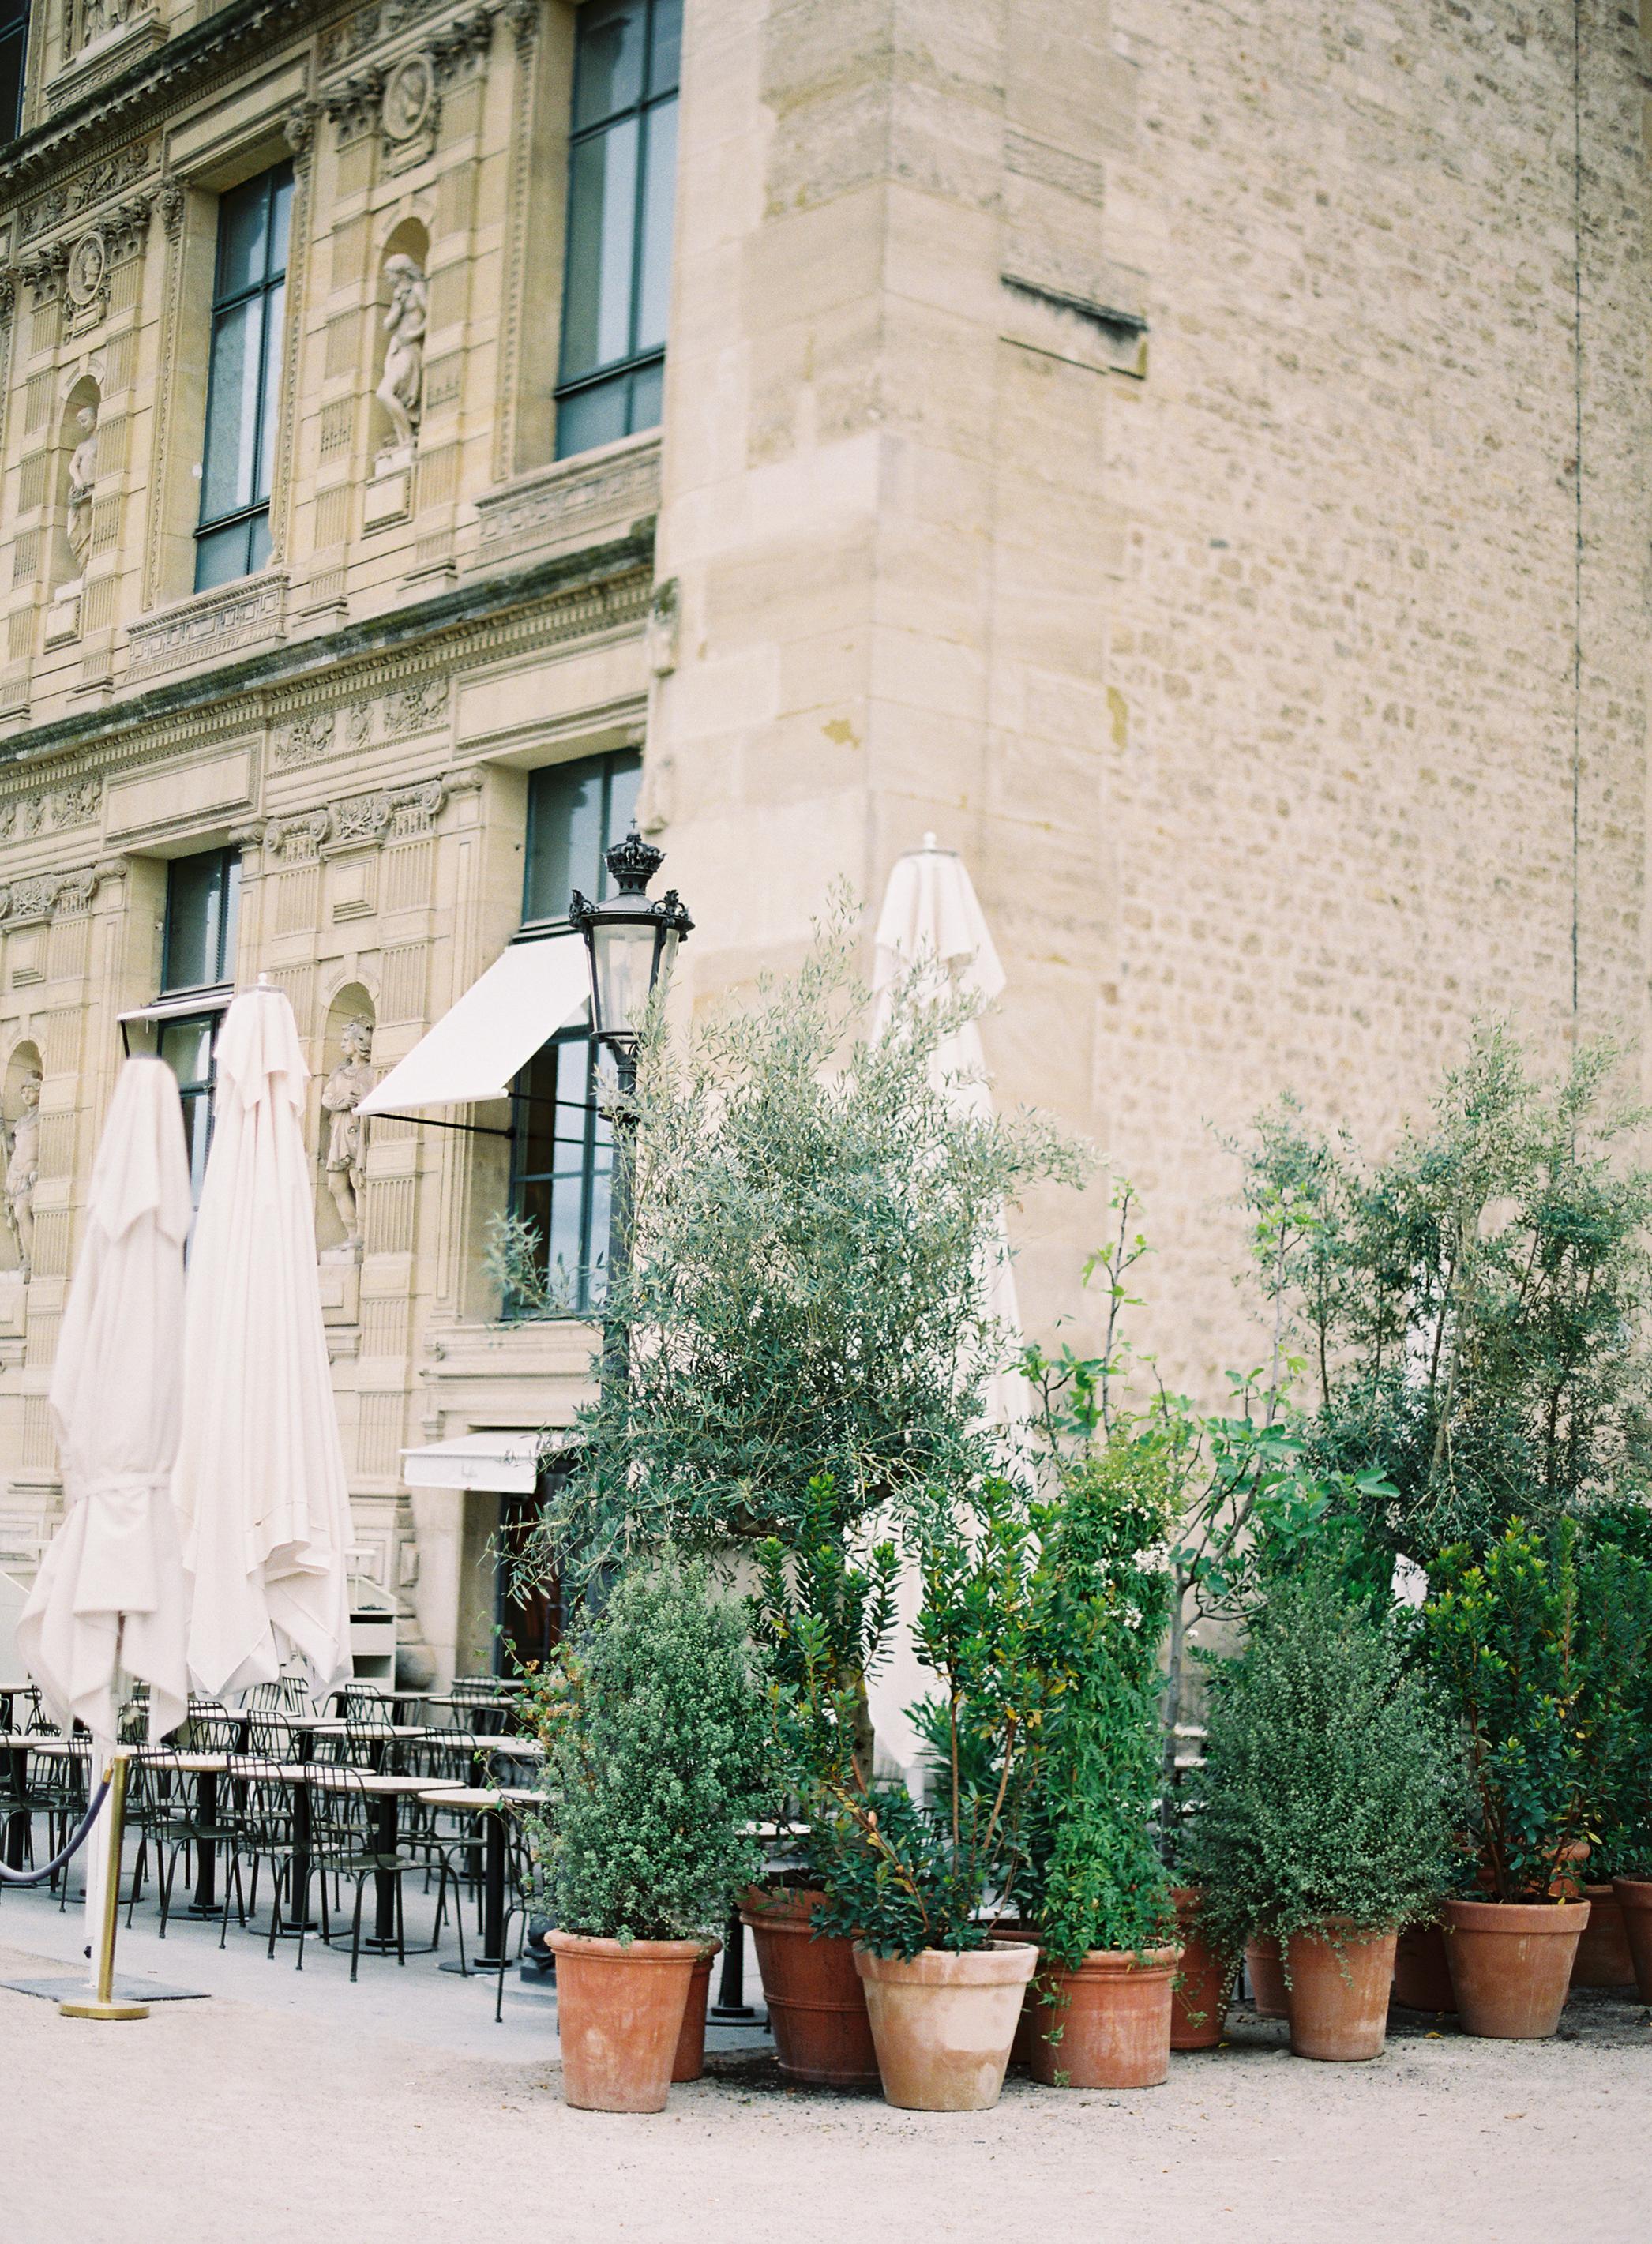 European Cafe - copyright: Carrie King Photographer